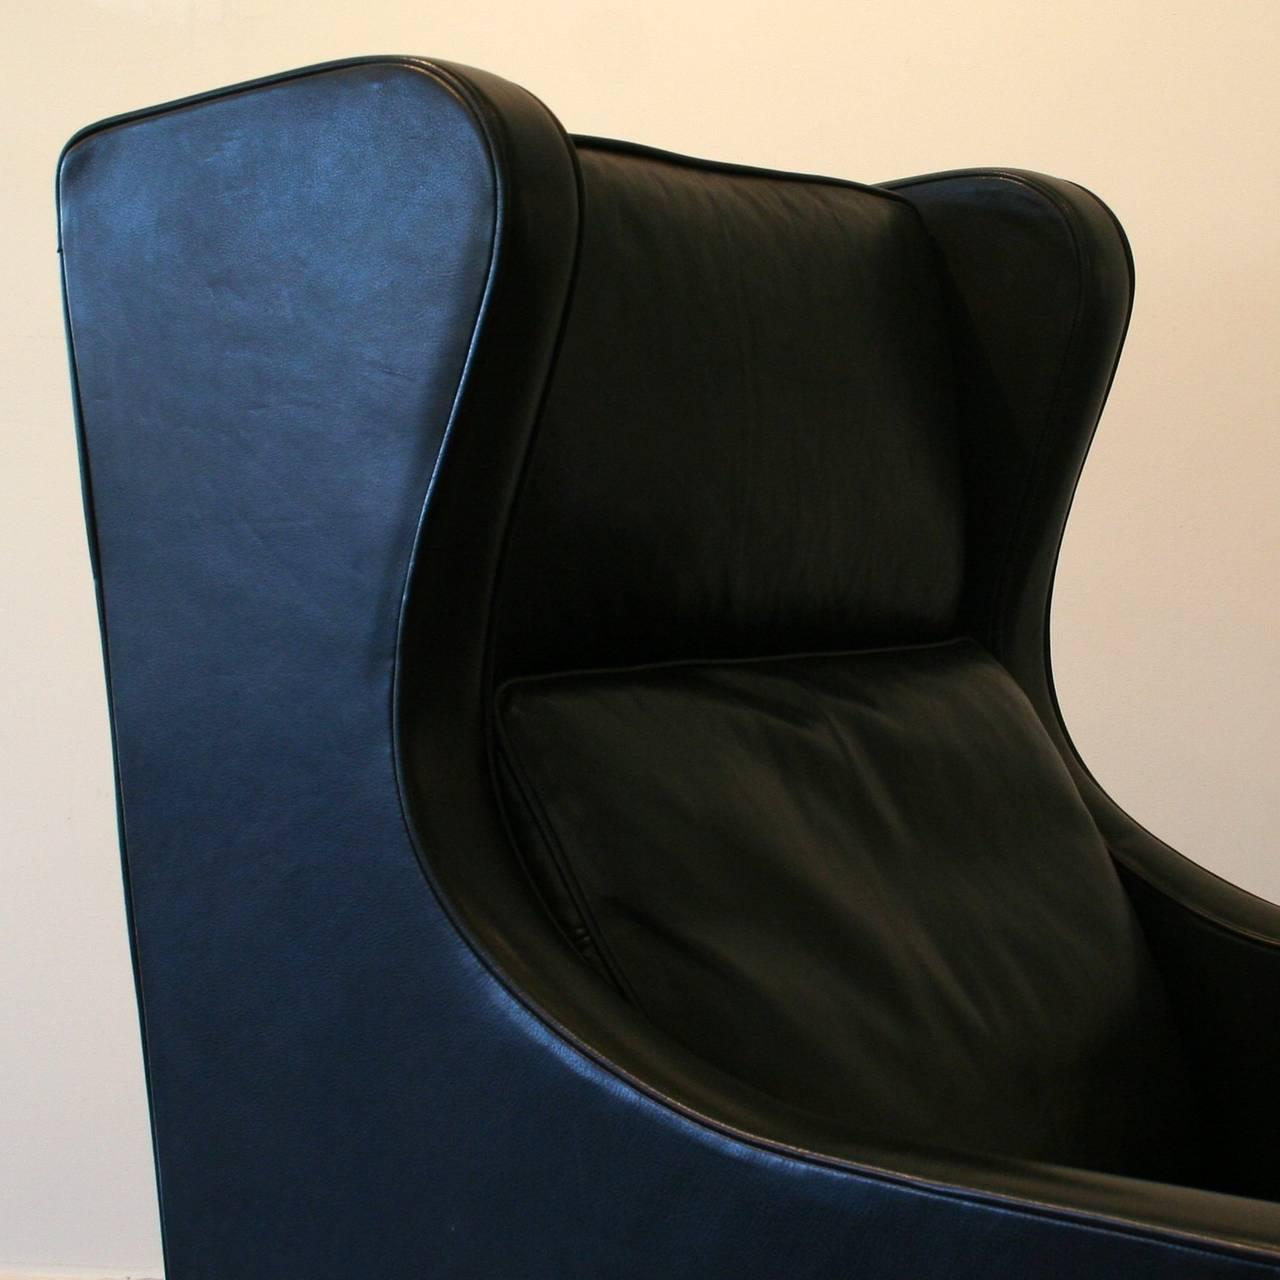 black leather wingback chair mechanics hydraulic stool vintage danish at 1stdibs